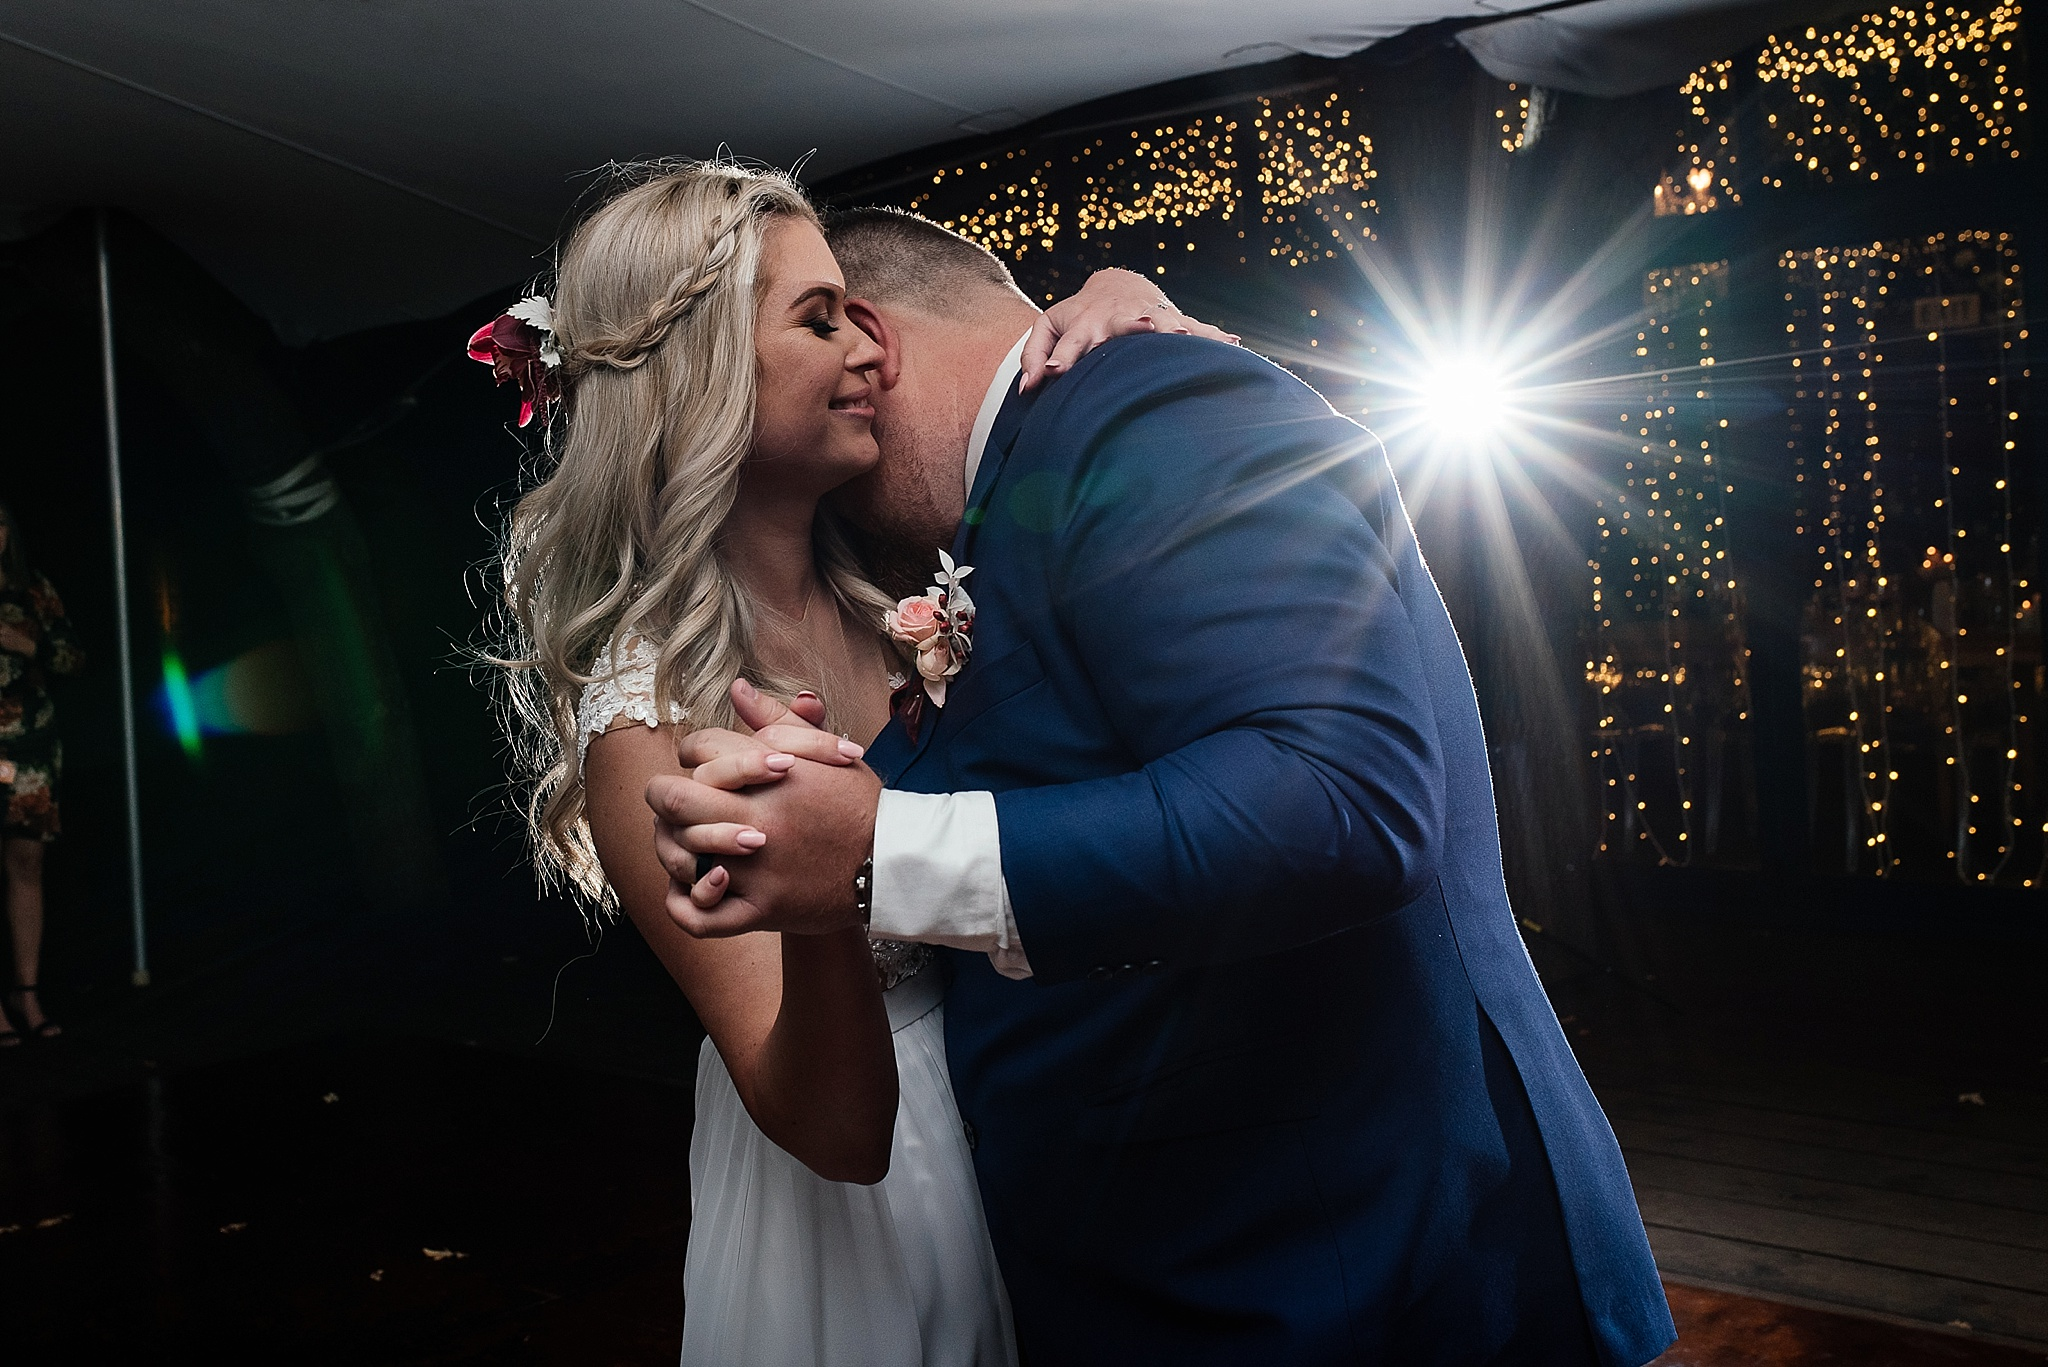 Cape Town Photographer Darren Bester - Die Woud Wedding - Gareth & Roxanne_0057.jpg